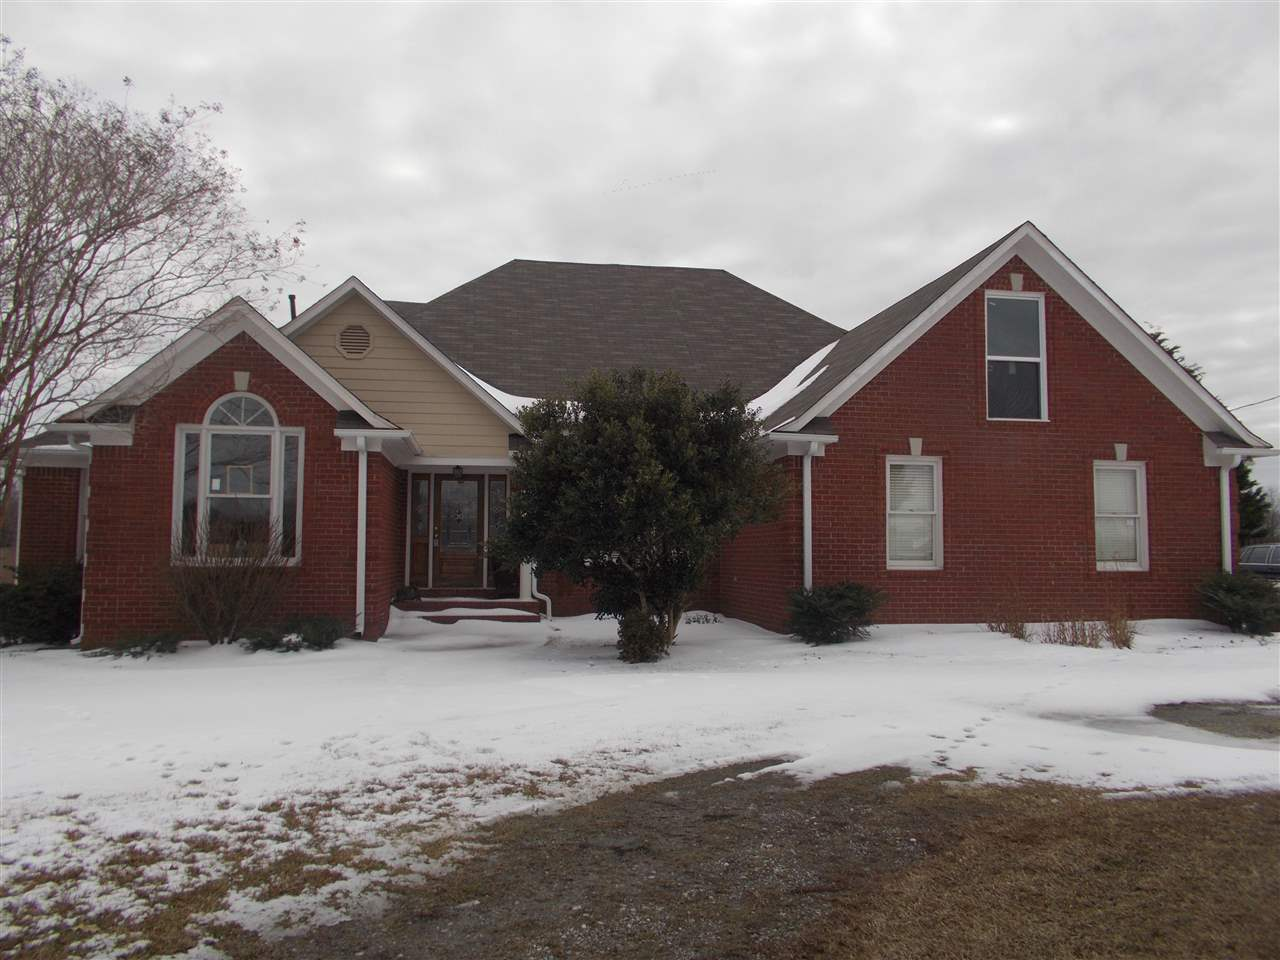 255 Culbreath, Covington, TN 38019